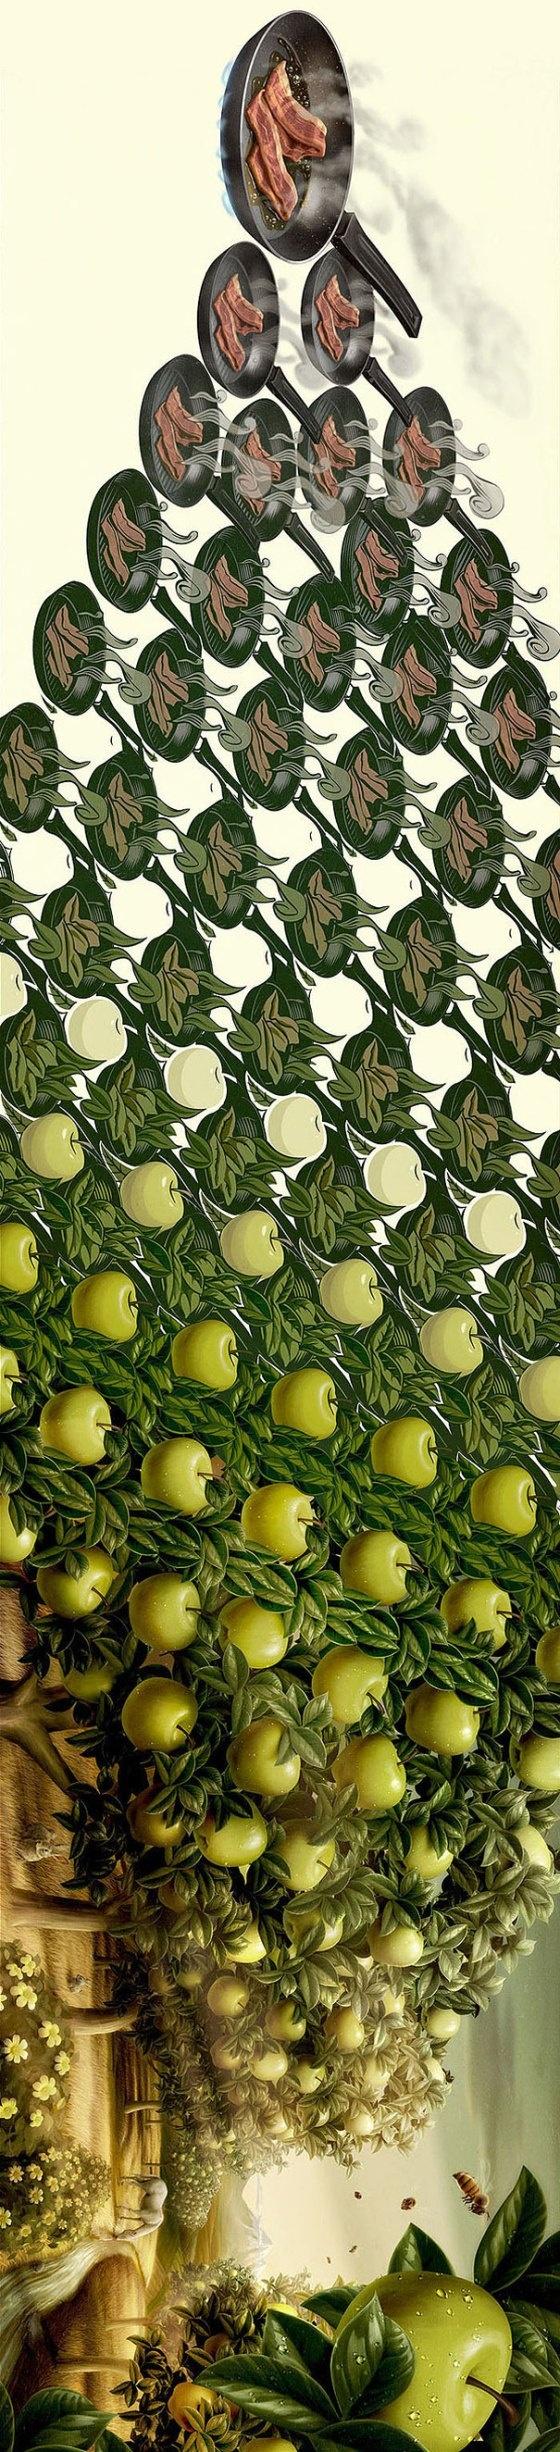 oscar-ramos-